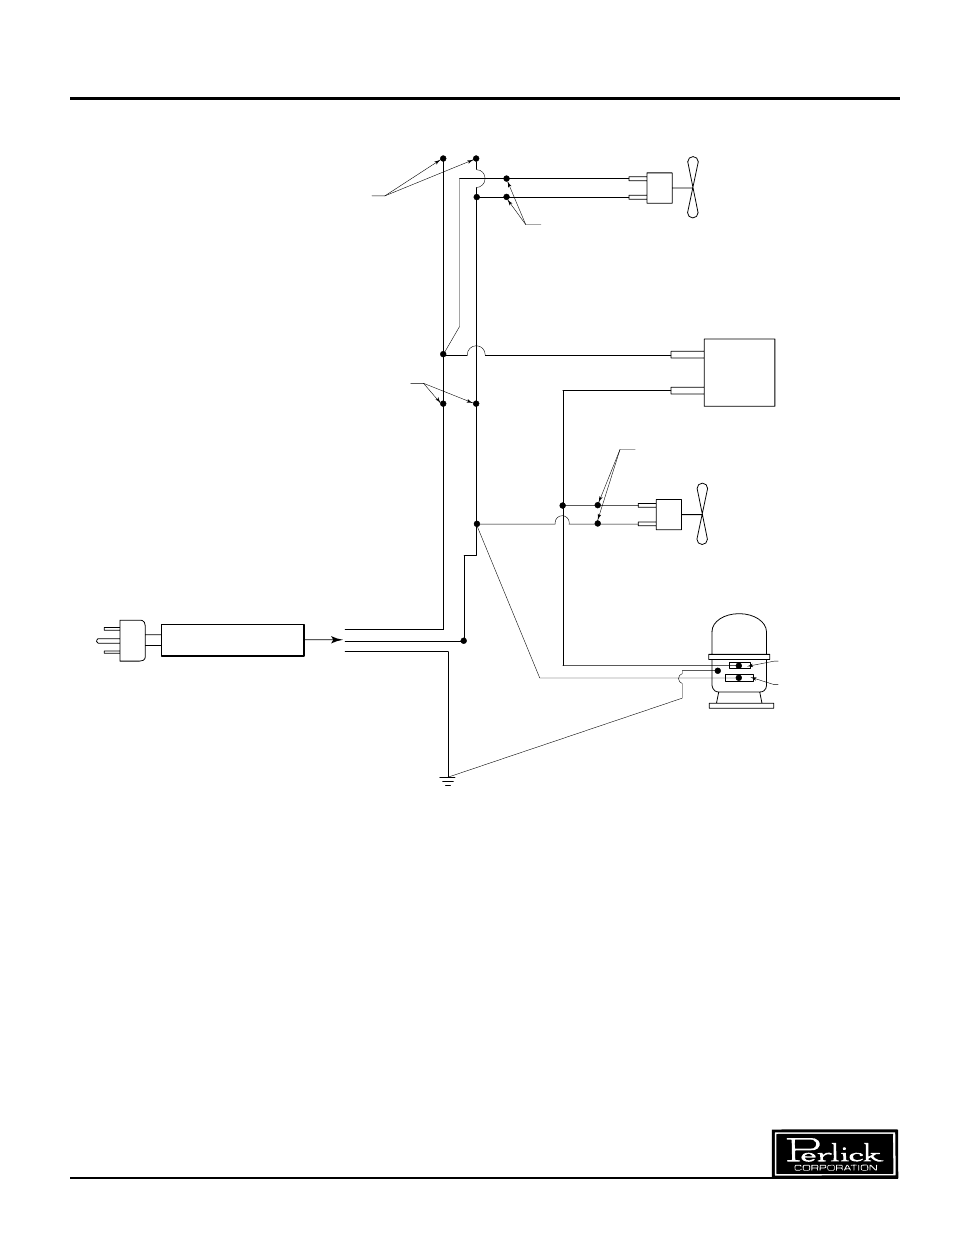 wiring diagram single door refrigerator perlick r24n user manual rh manualsdir com 3-Way Switch Wiring Diagram Automotive Wiring Diagrams